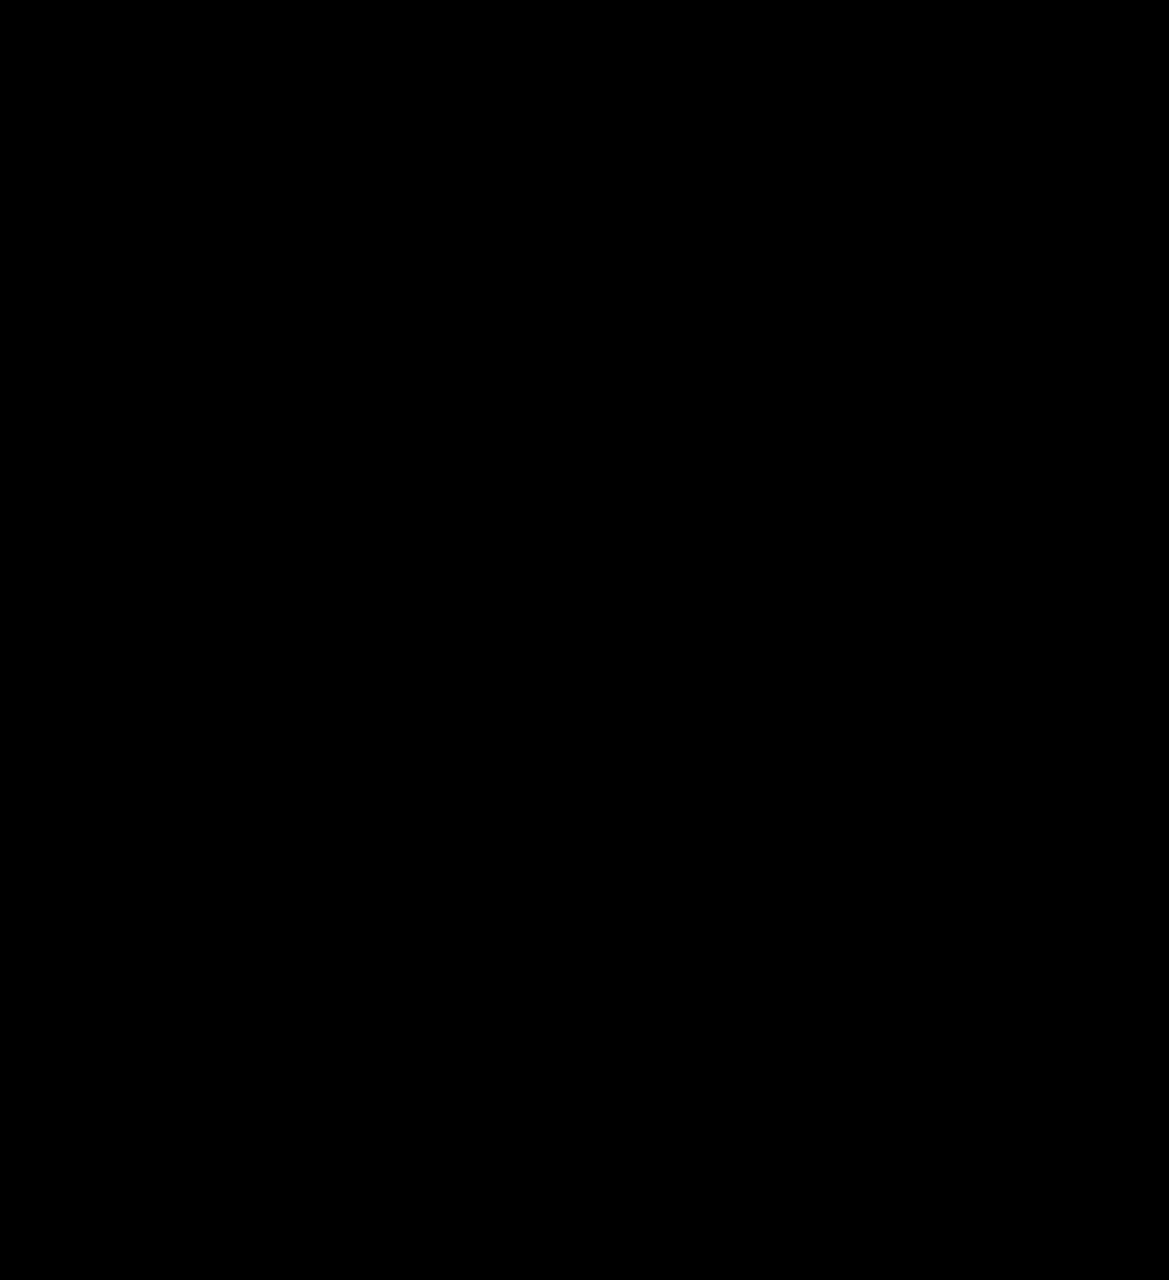 maze-4335226_1280